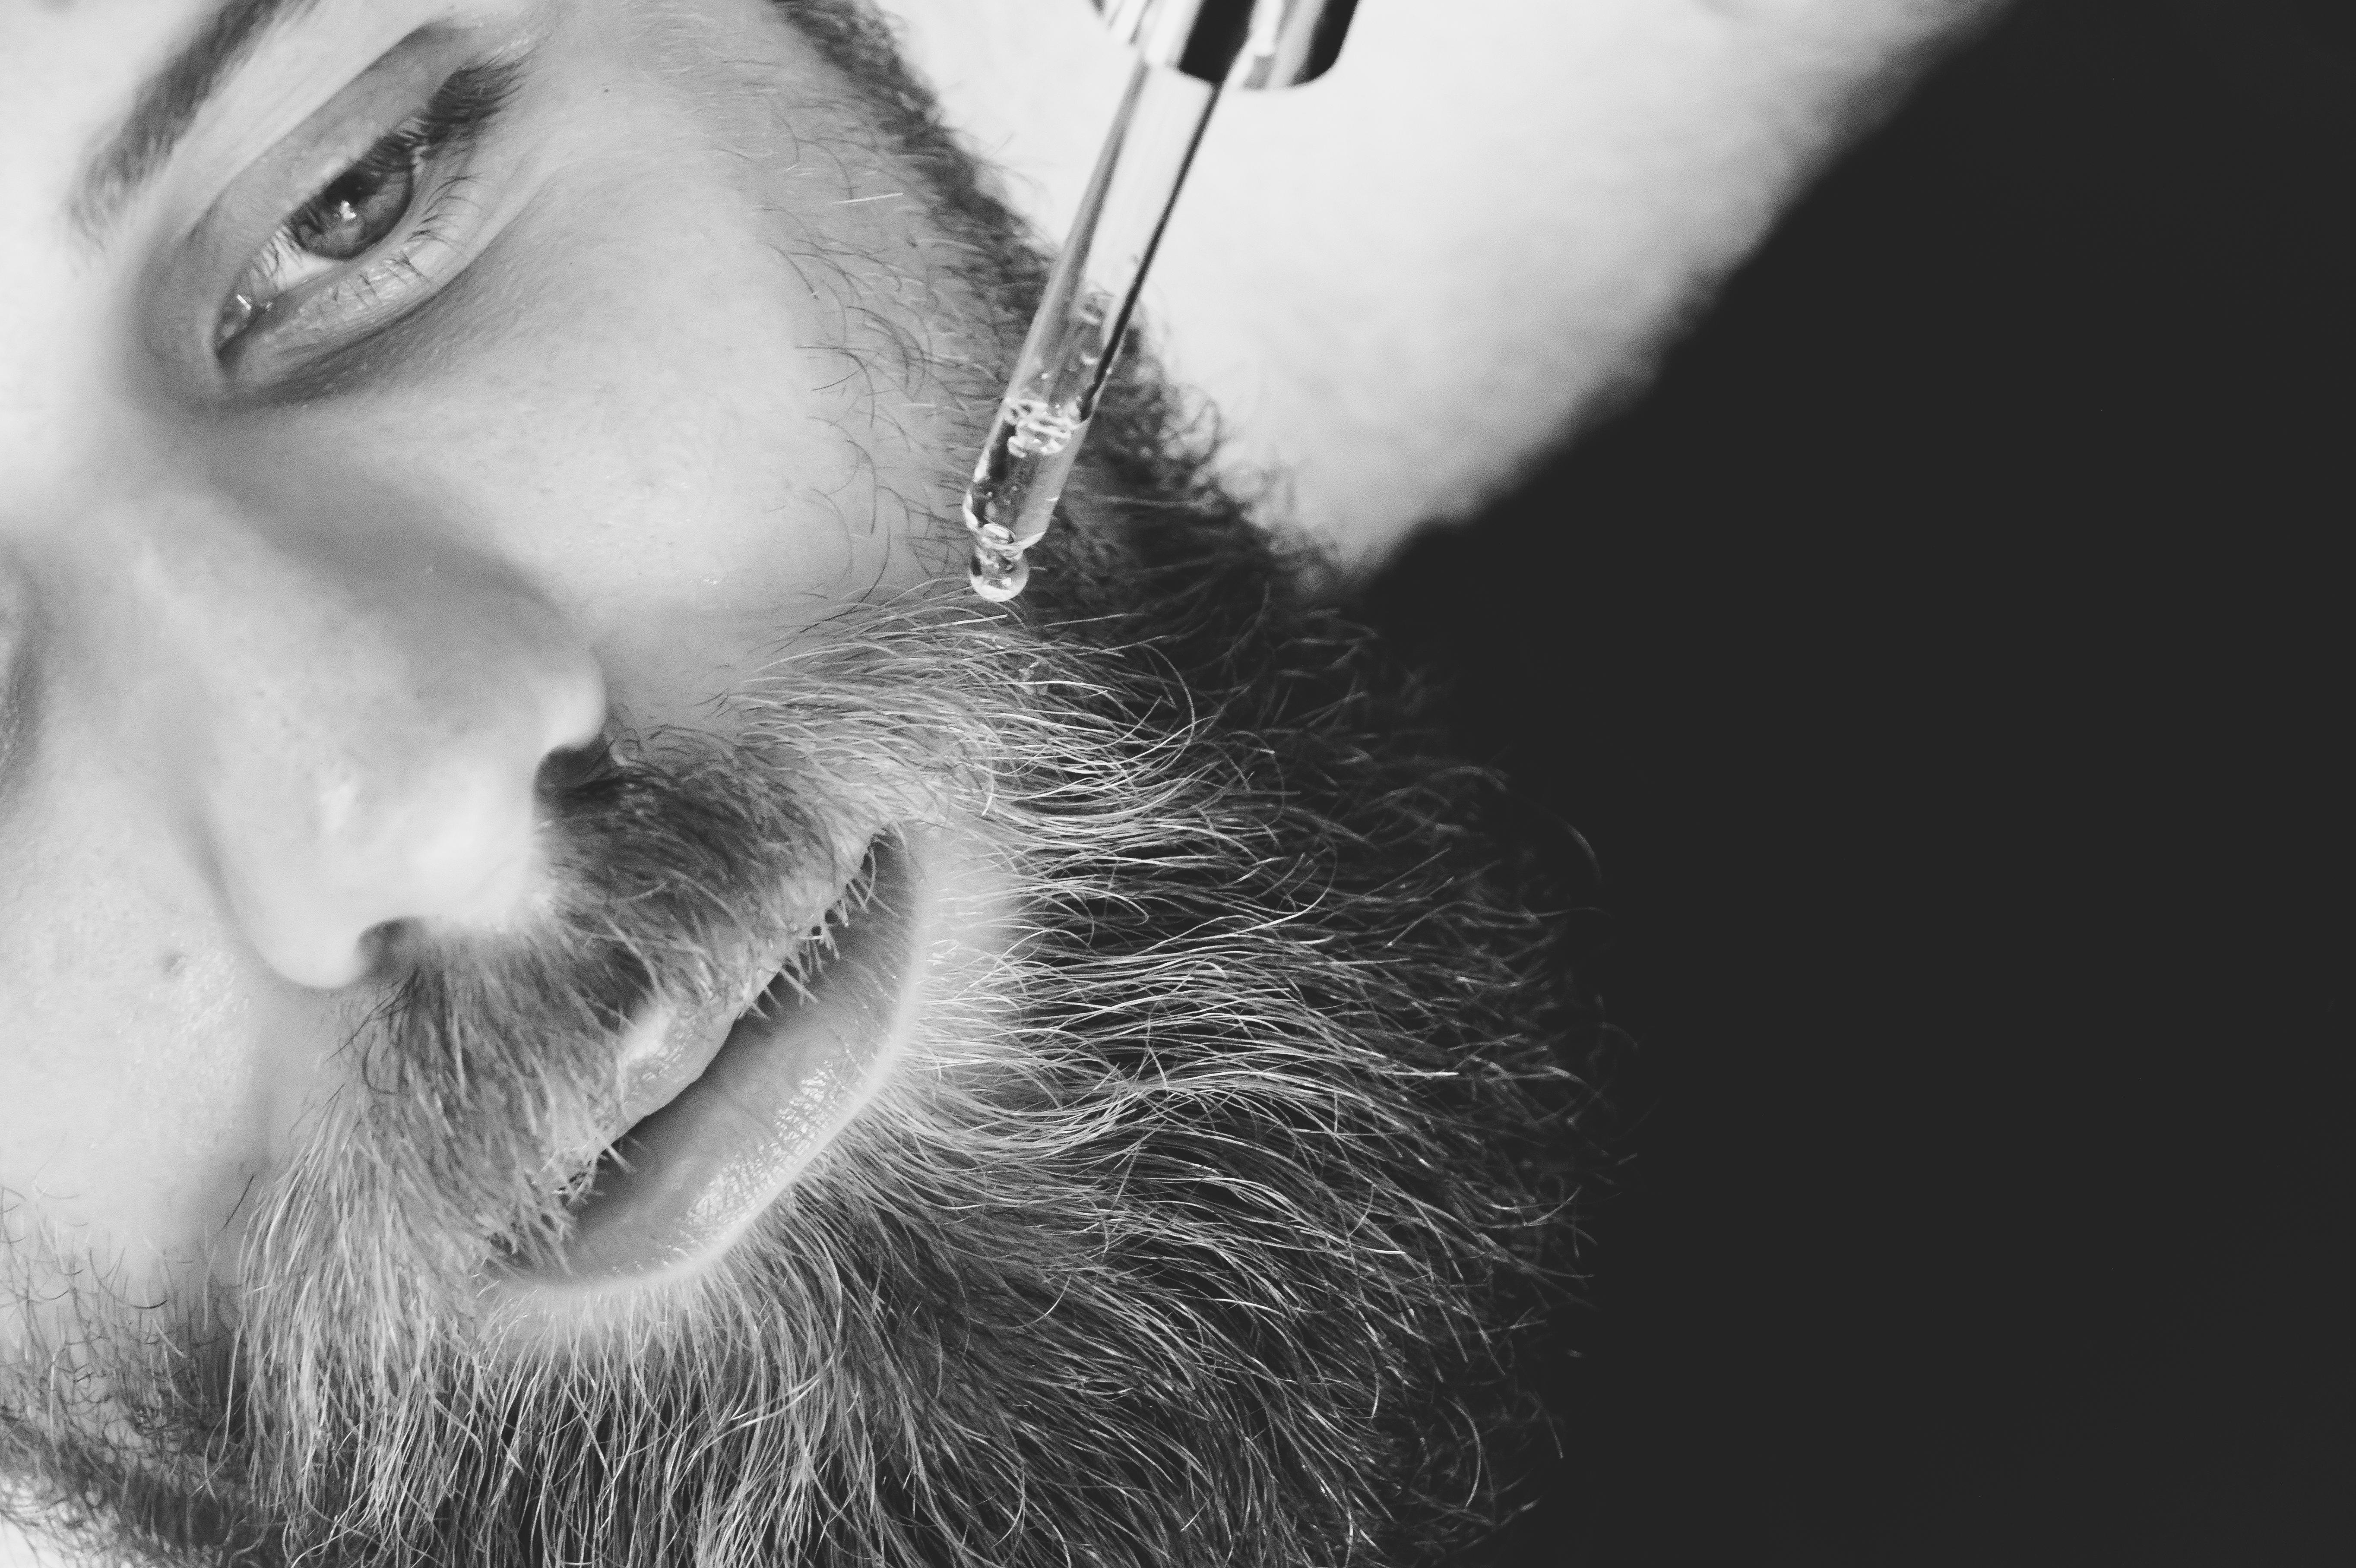 Man applying beard oil